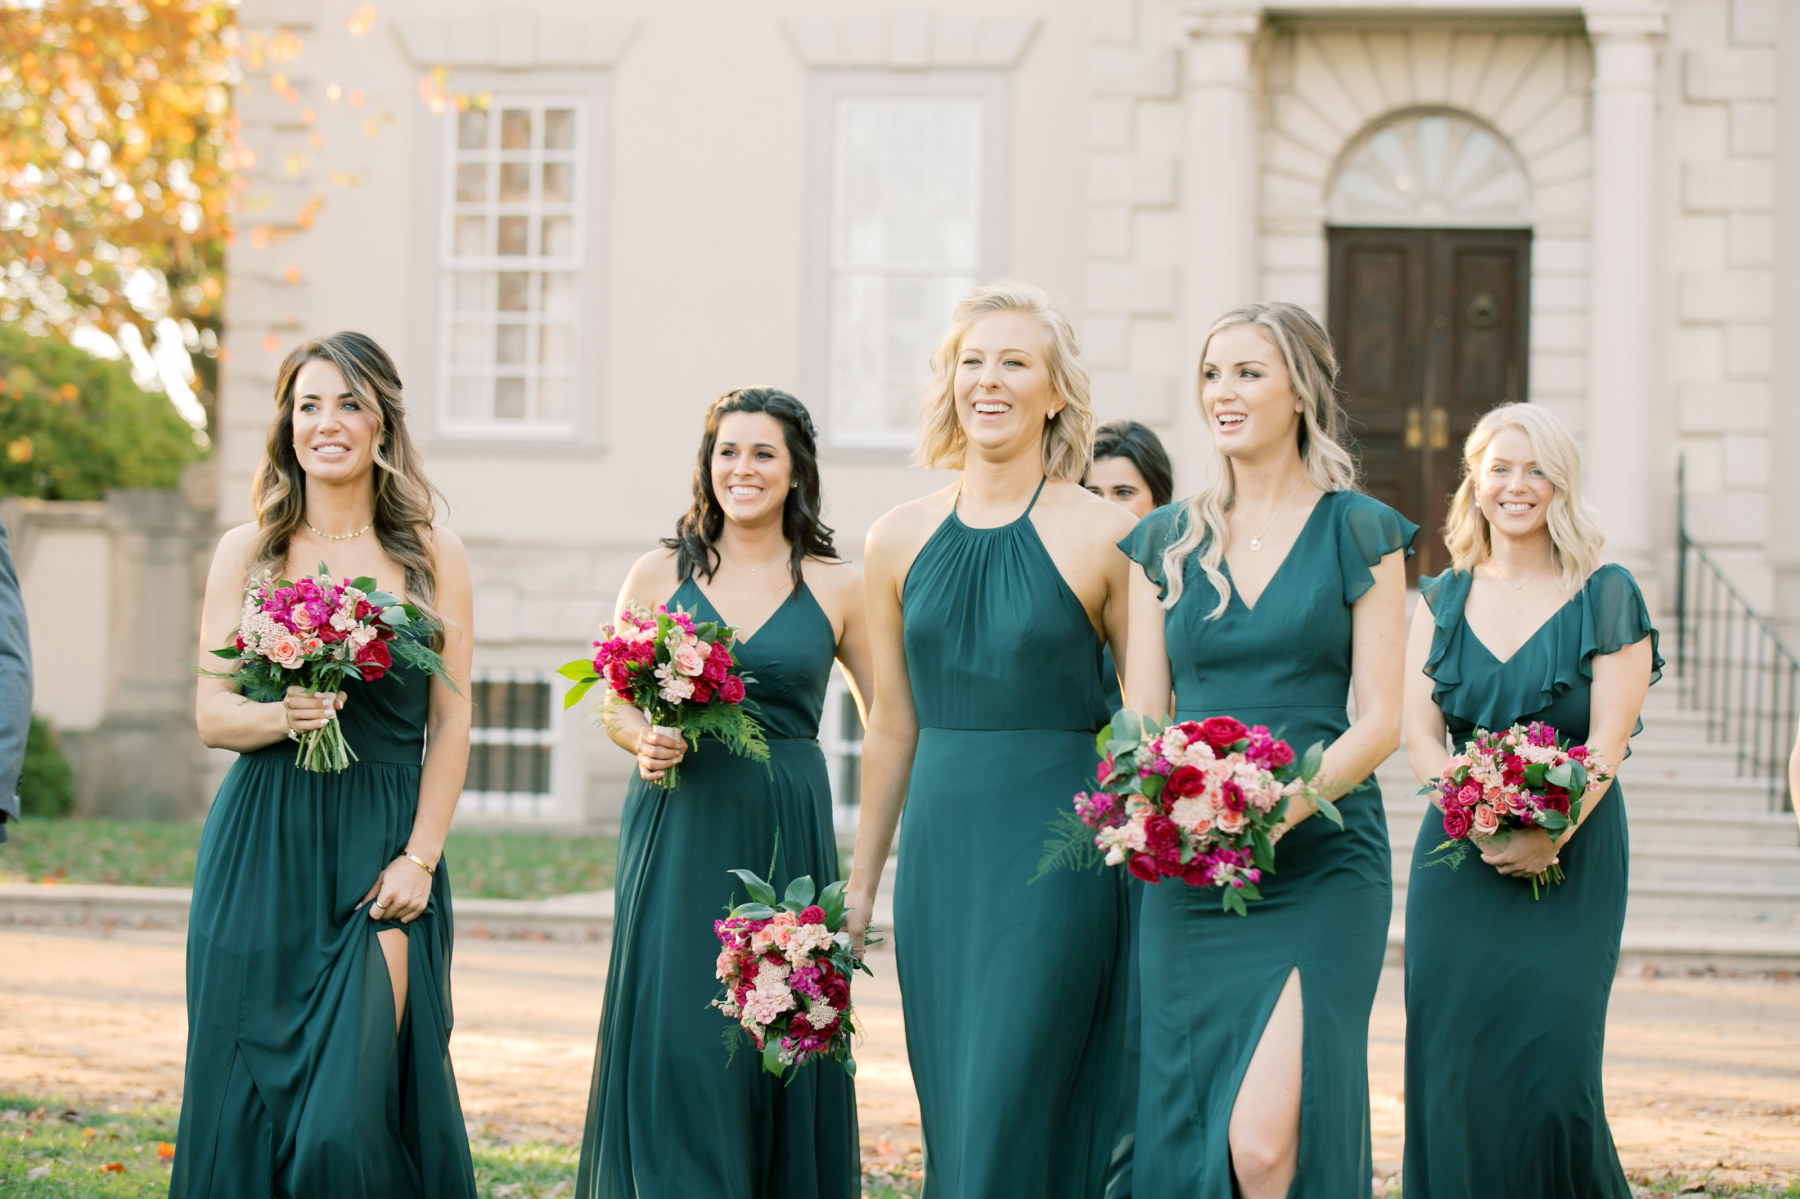 43Great_Marsh_Estates_Wedding_Anne_Kelley_Events_Astrid_Photography_U7A0687